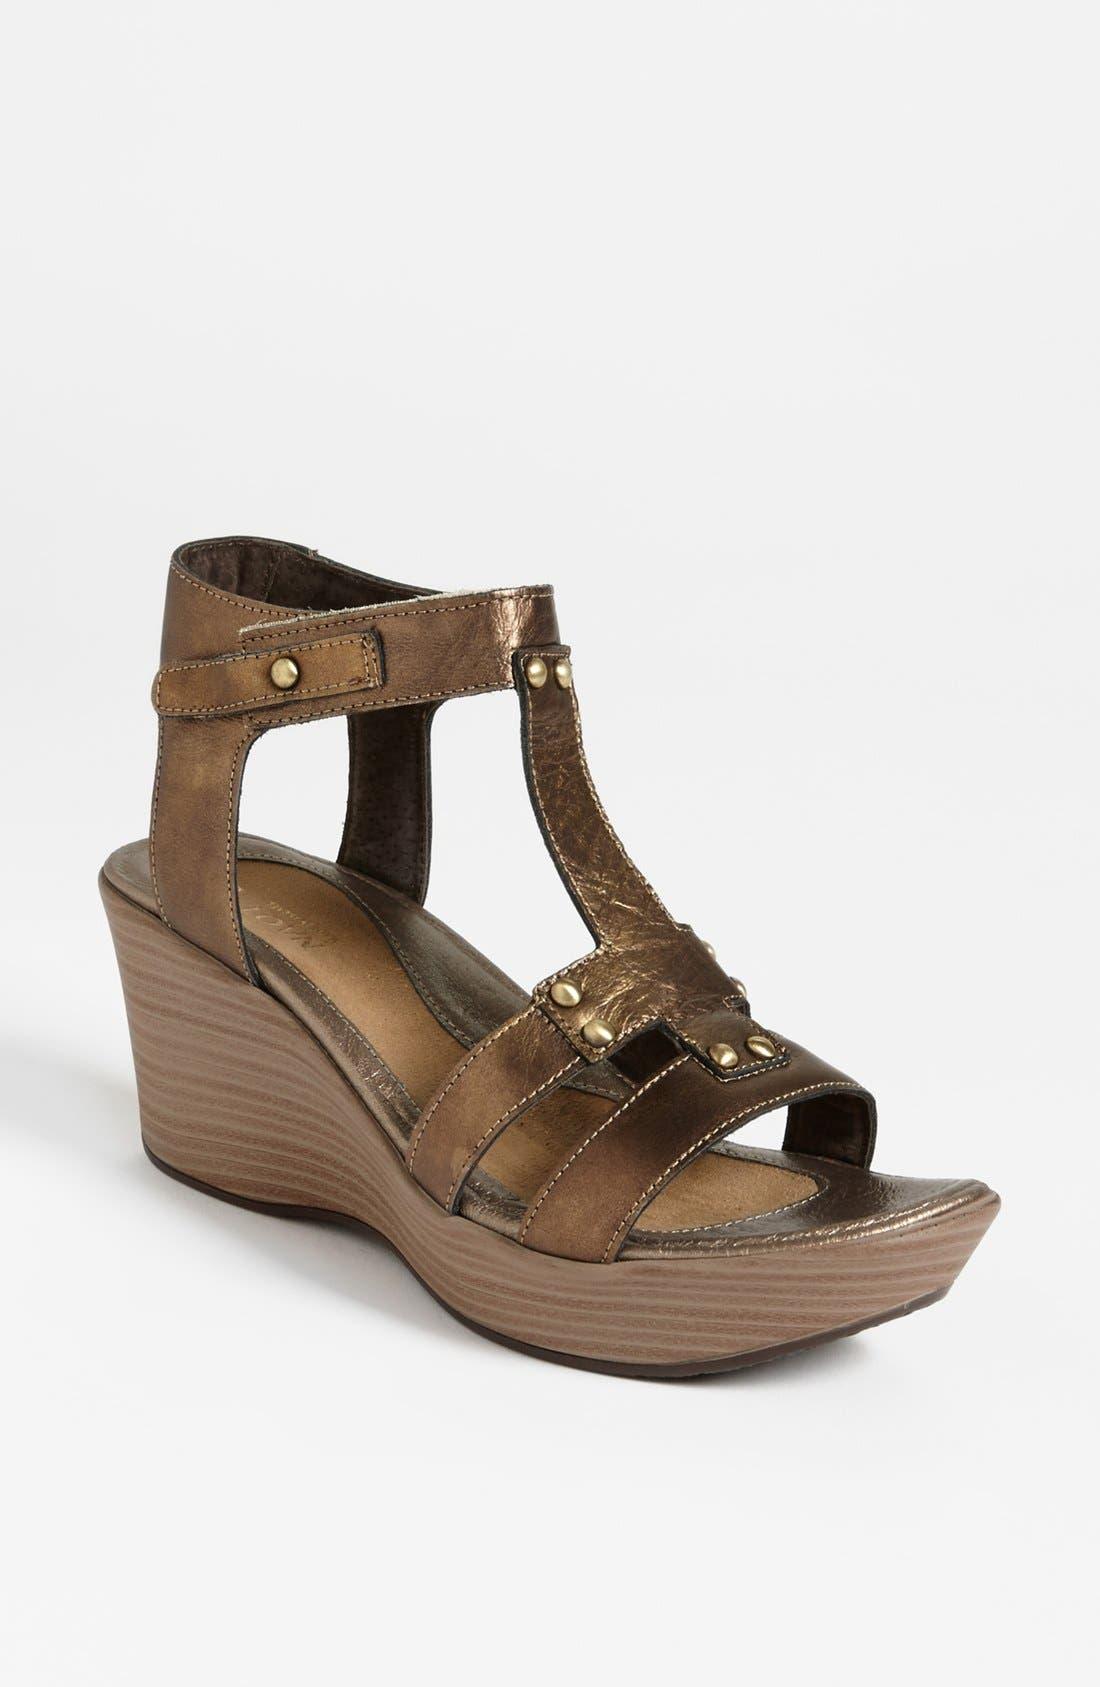 Main Image - Naot 'Flirt' Sandal